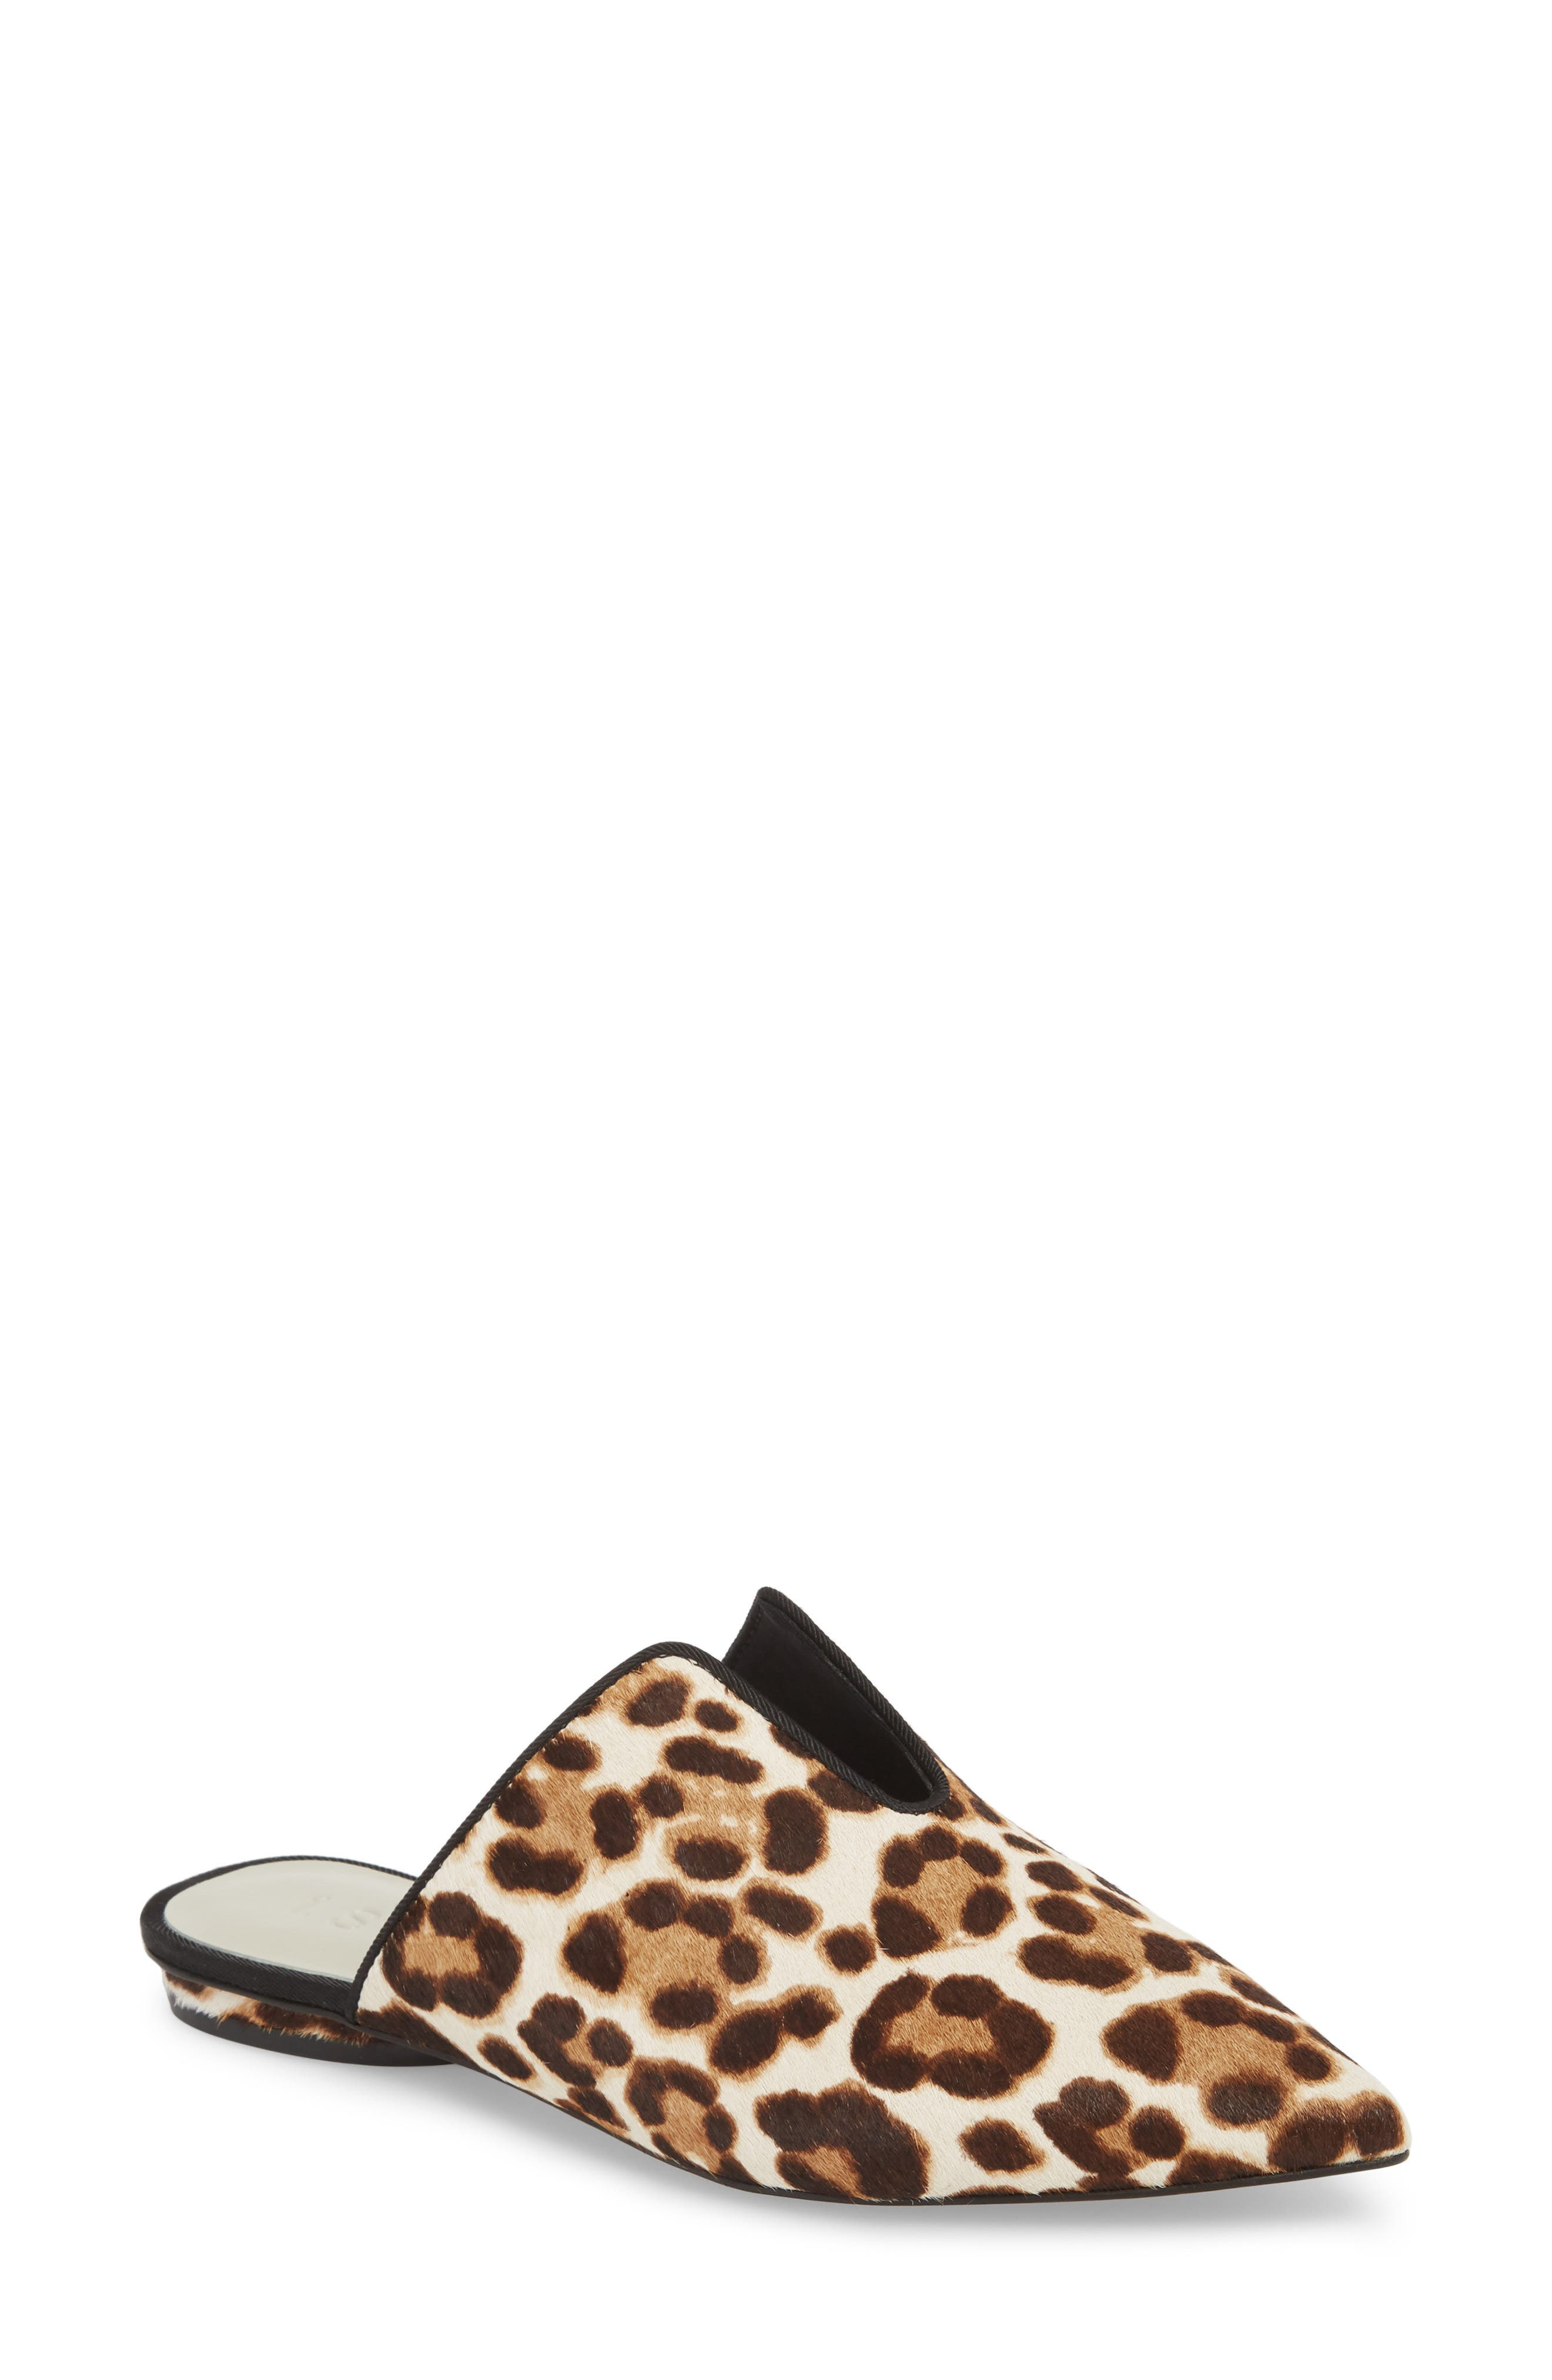 Genia Genuine Calf Hair Mule,                         Main,                         color, Cheetah/ Black Calf Hair